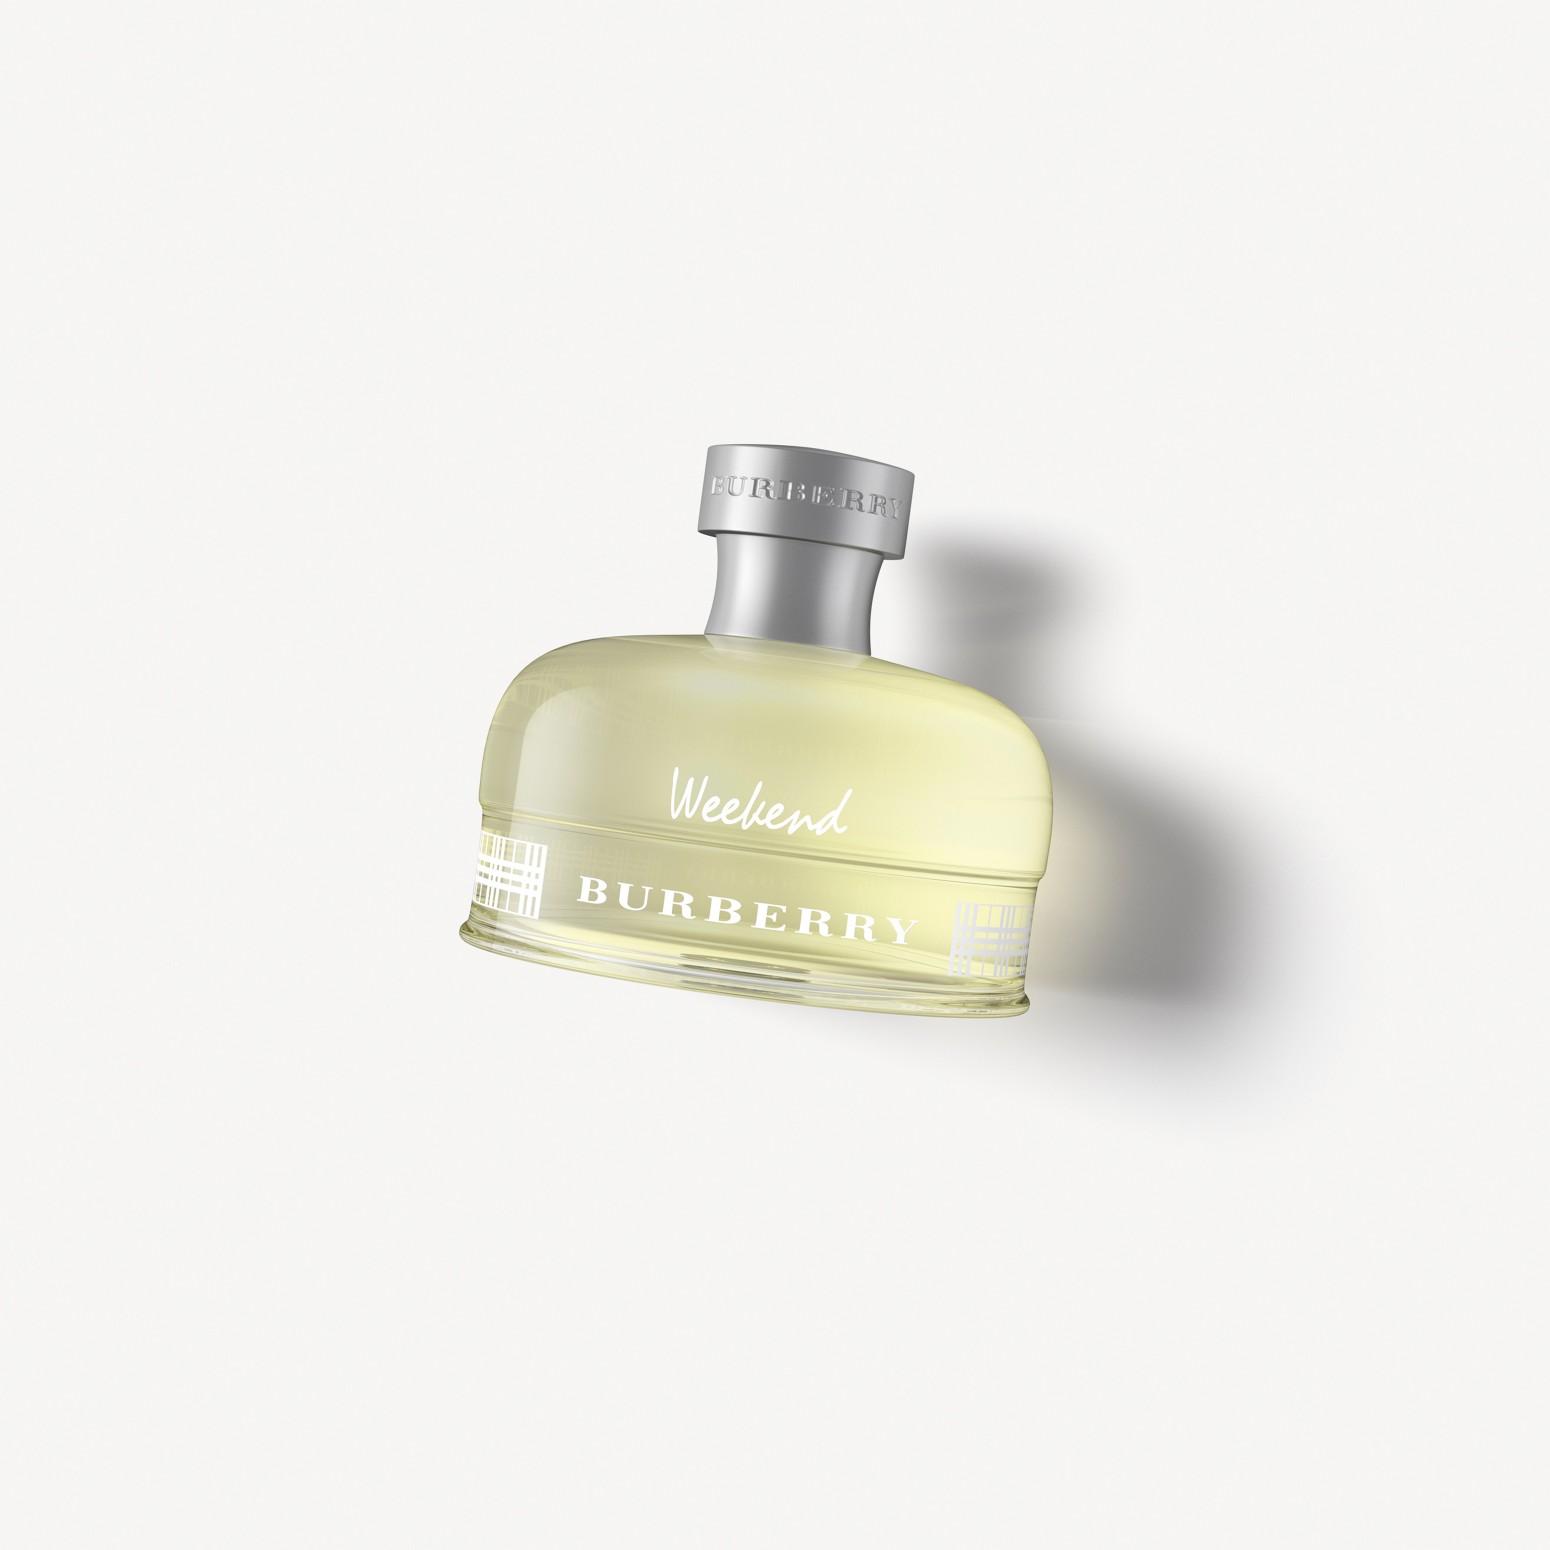 burberry weekend eau de parfum 100ml burberry. Black Bedroom Furniture Sets. Home Design Ideas